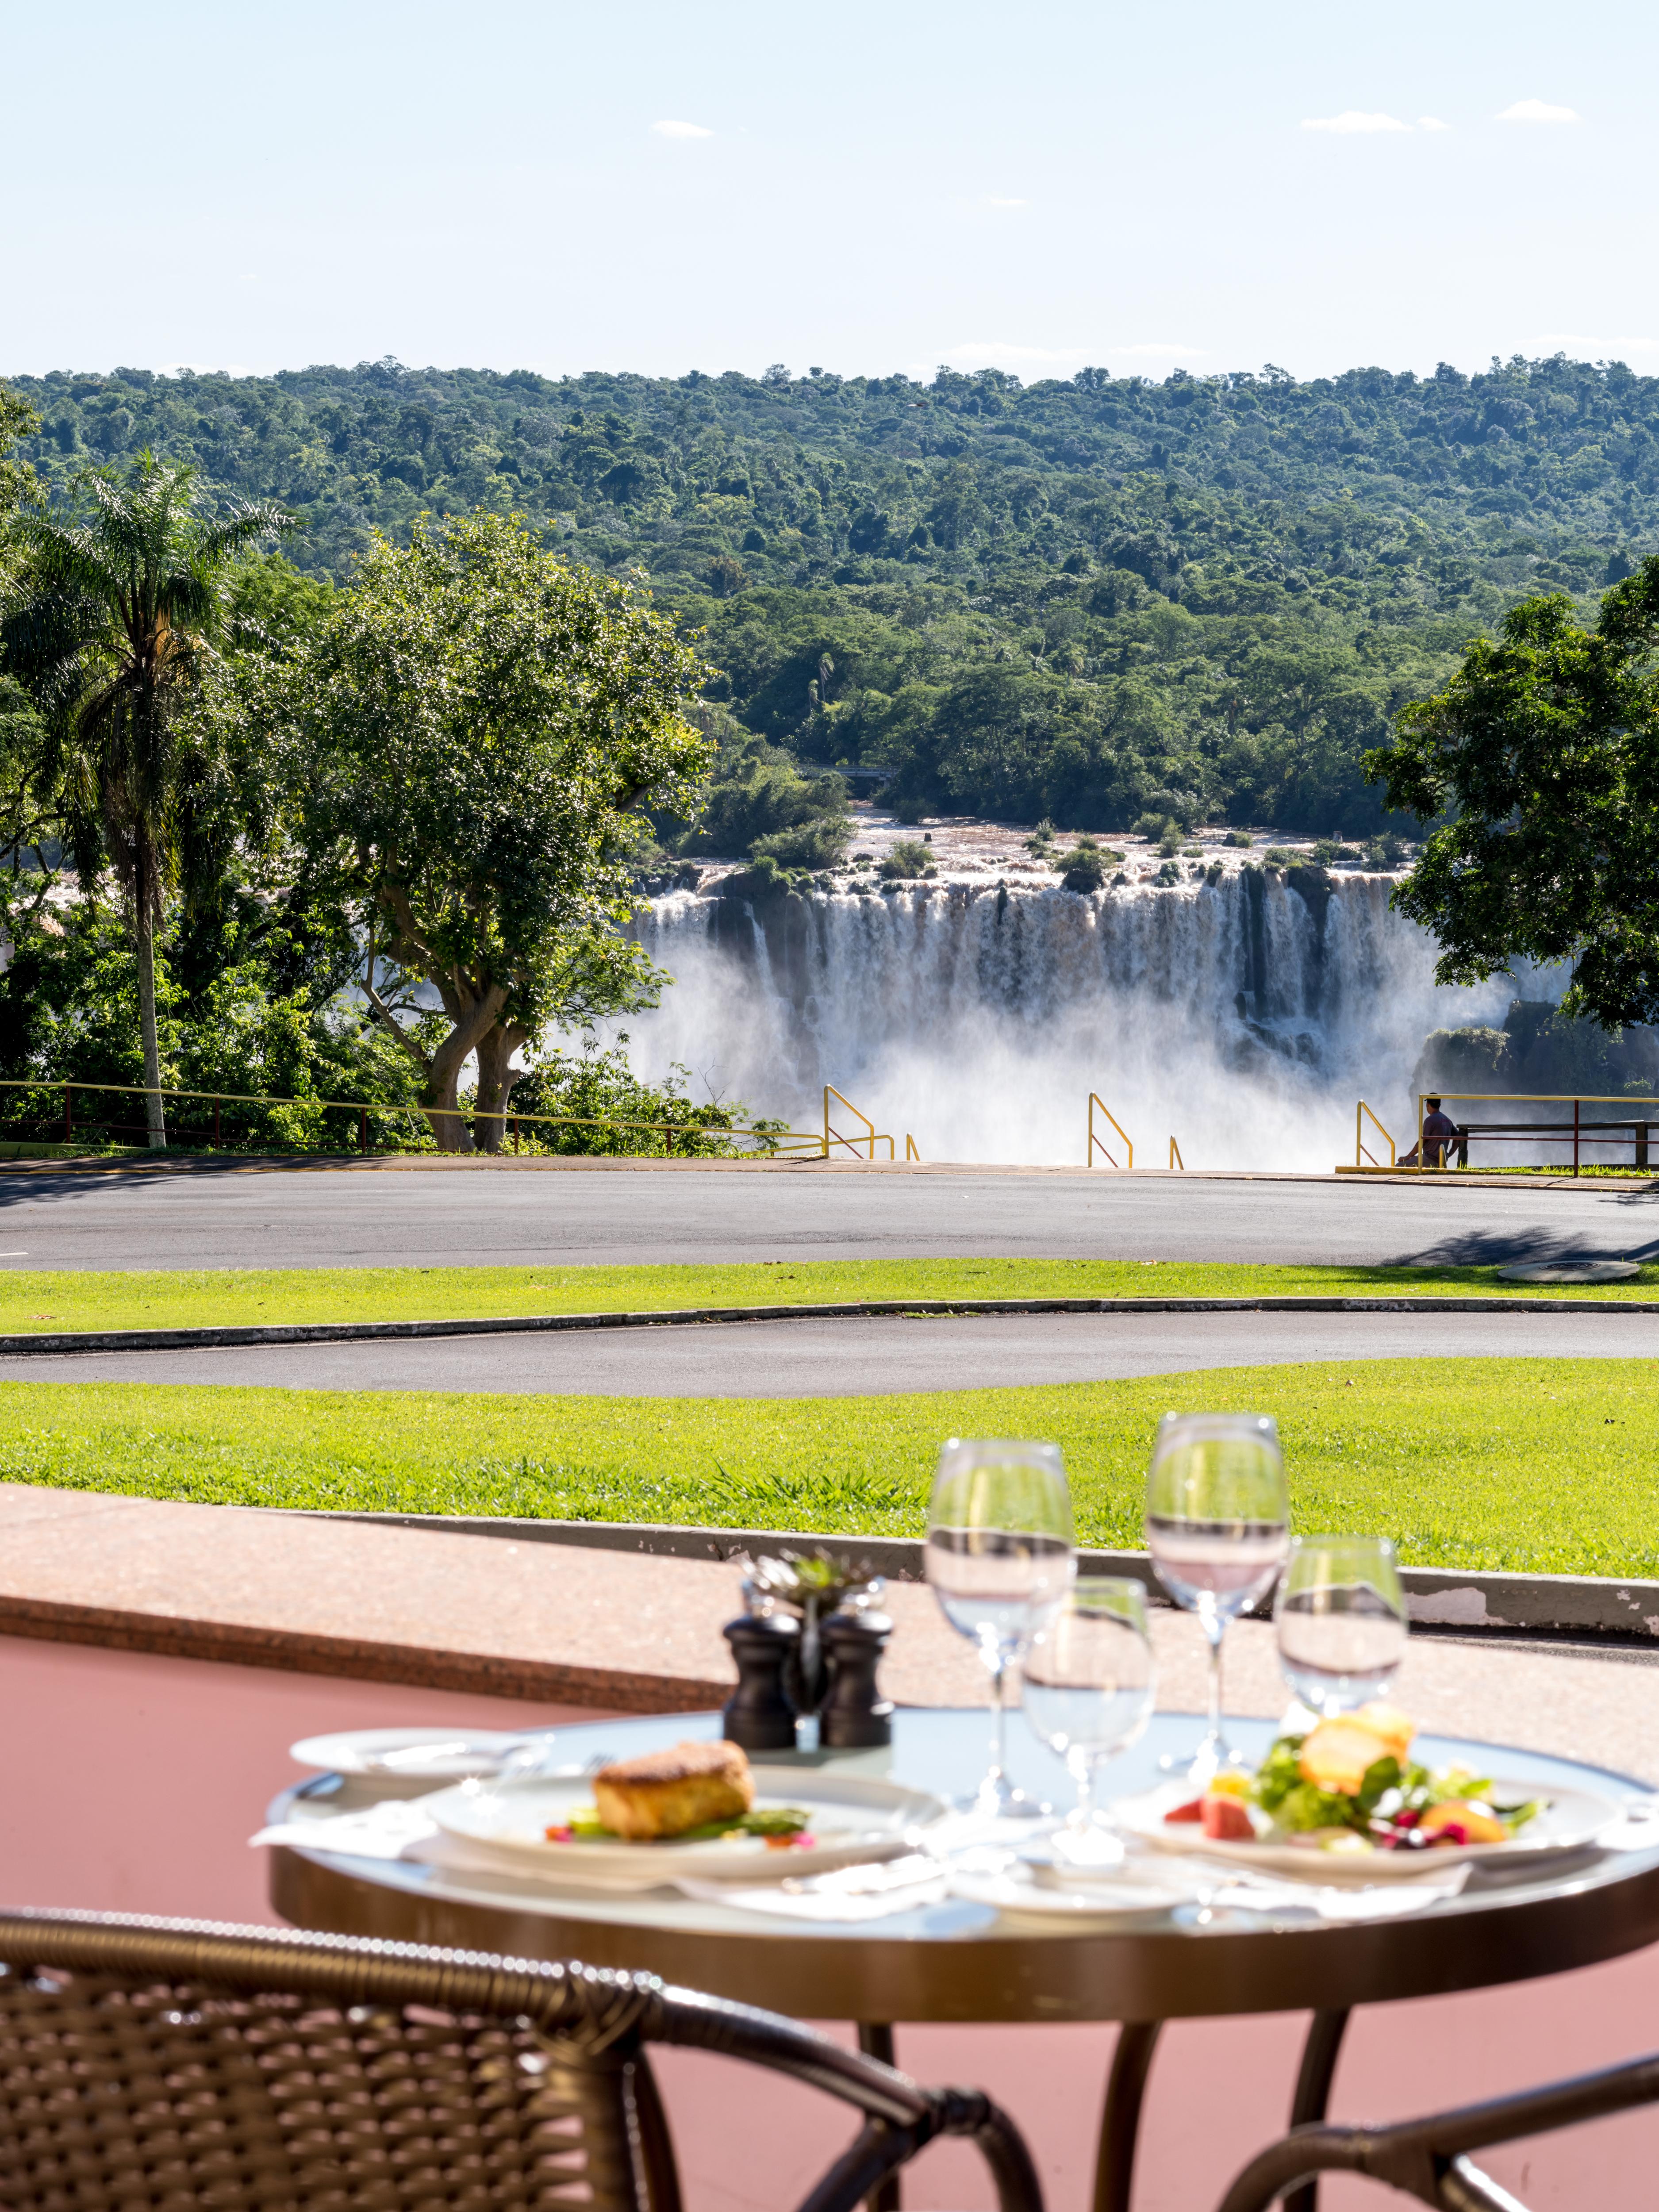 Belmond Hotel das Cataras at Iguassu Falls, Brazil dine by falls